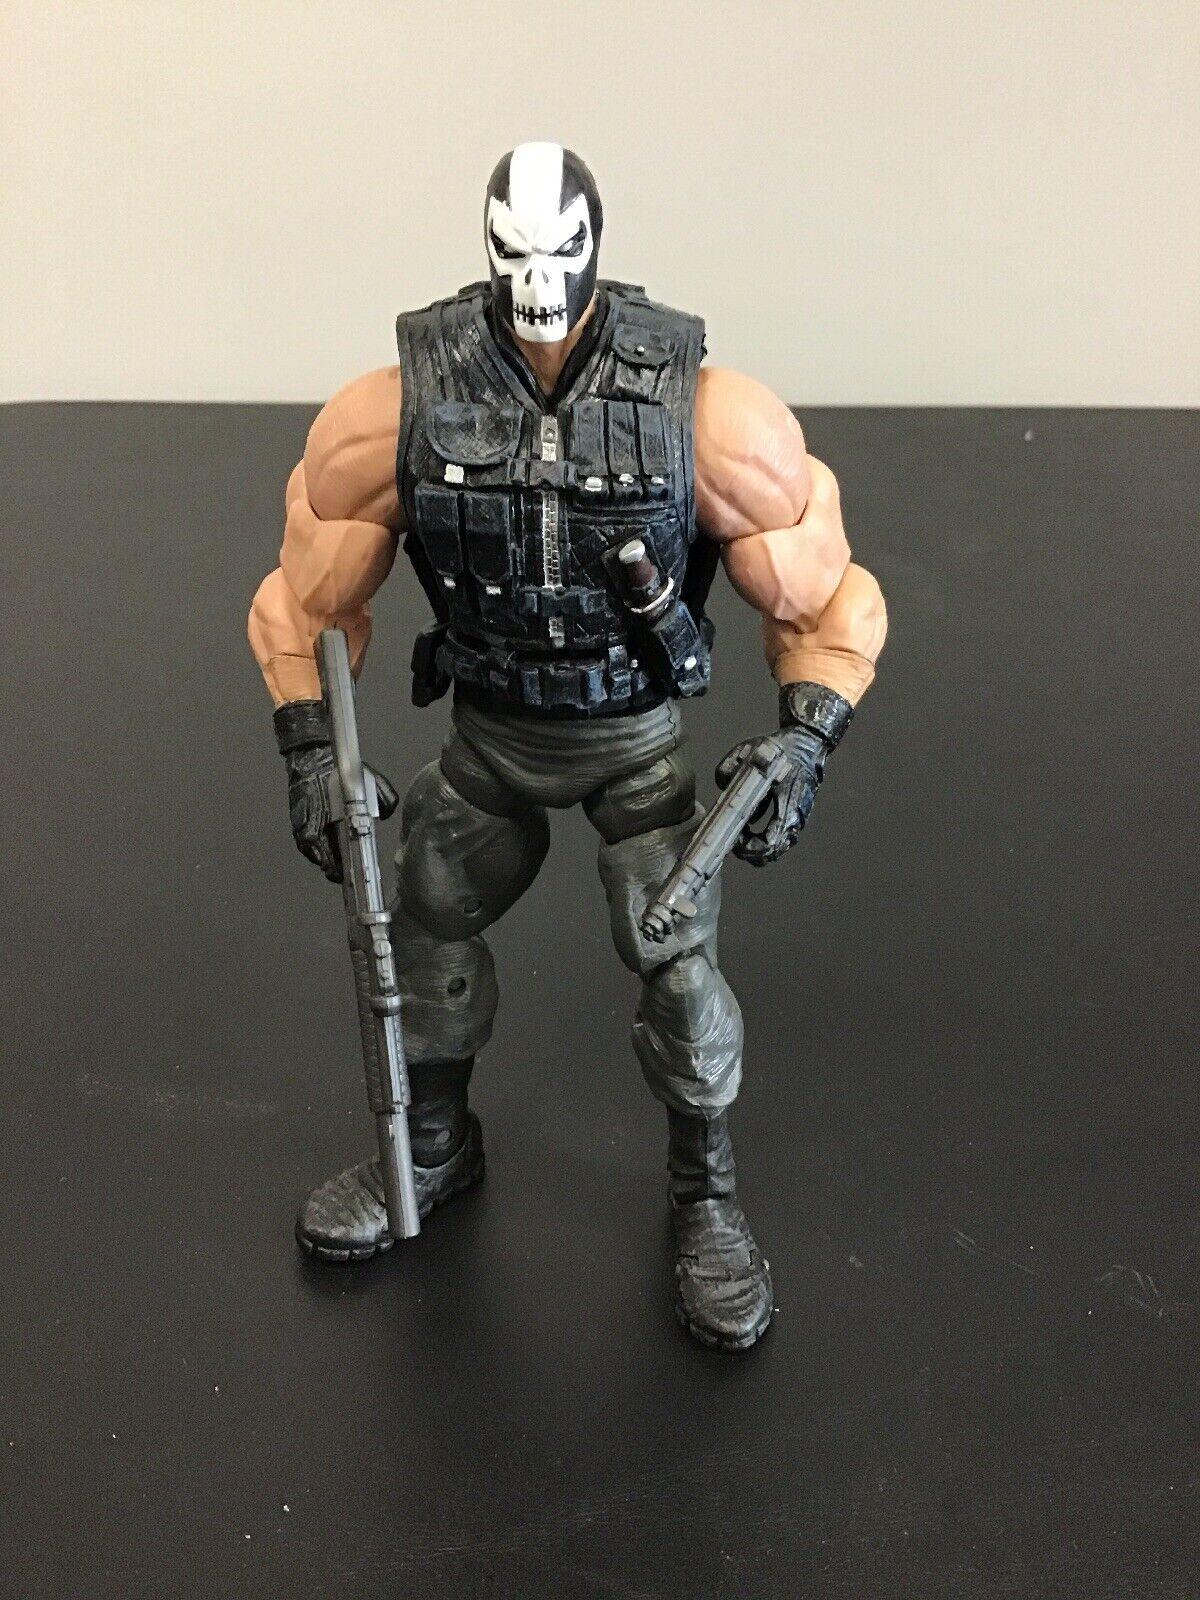 Marvel Legends Crossbones Walmart Exclusive Ares BAF Wave  Loose completare giocattolo Biz  al prezzo più basso